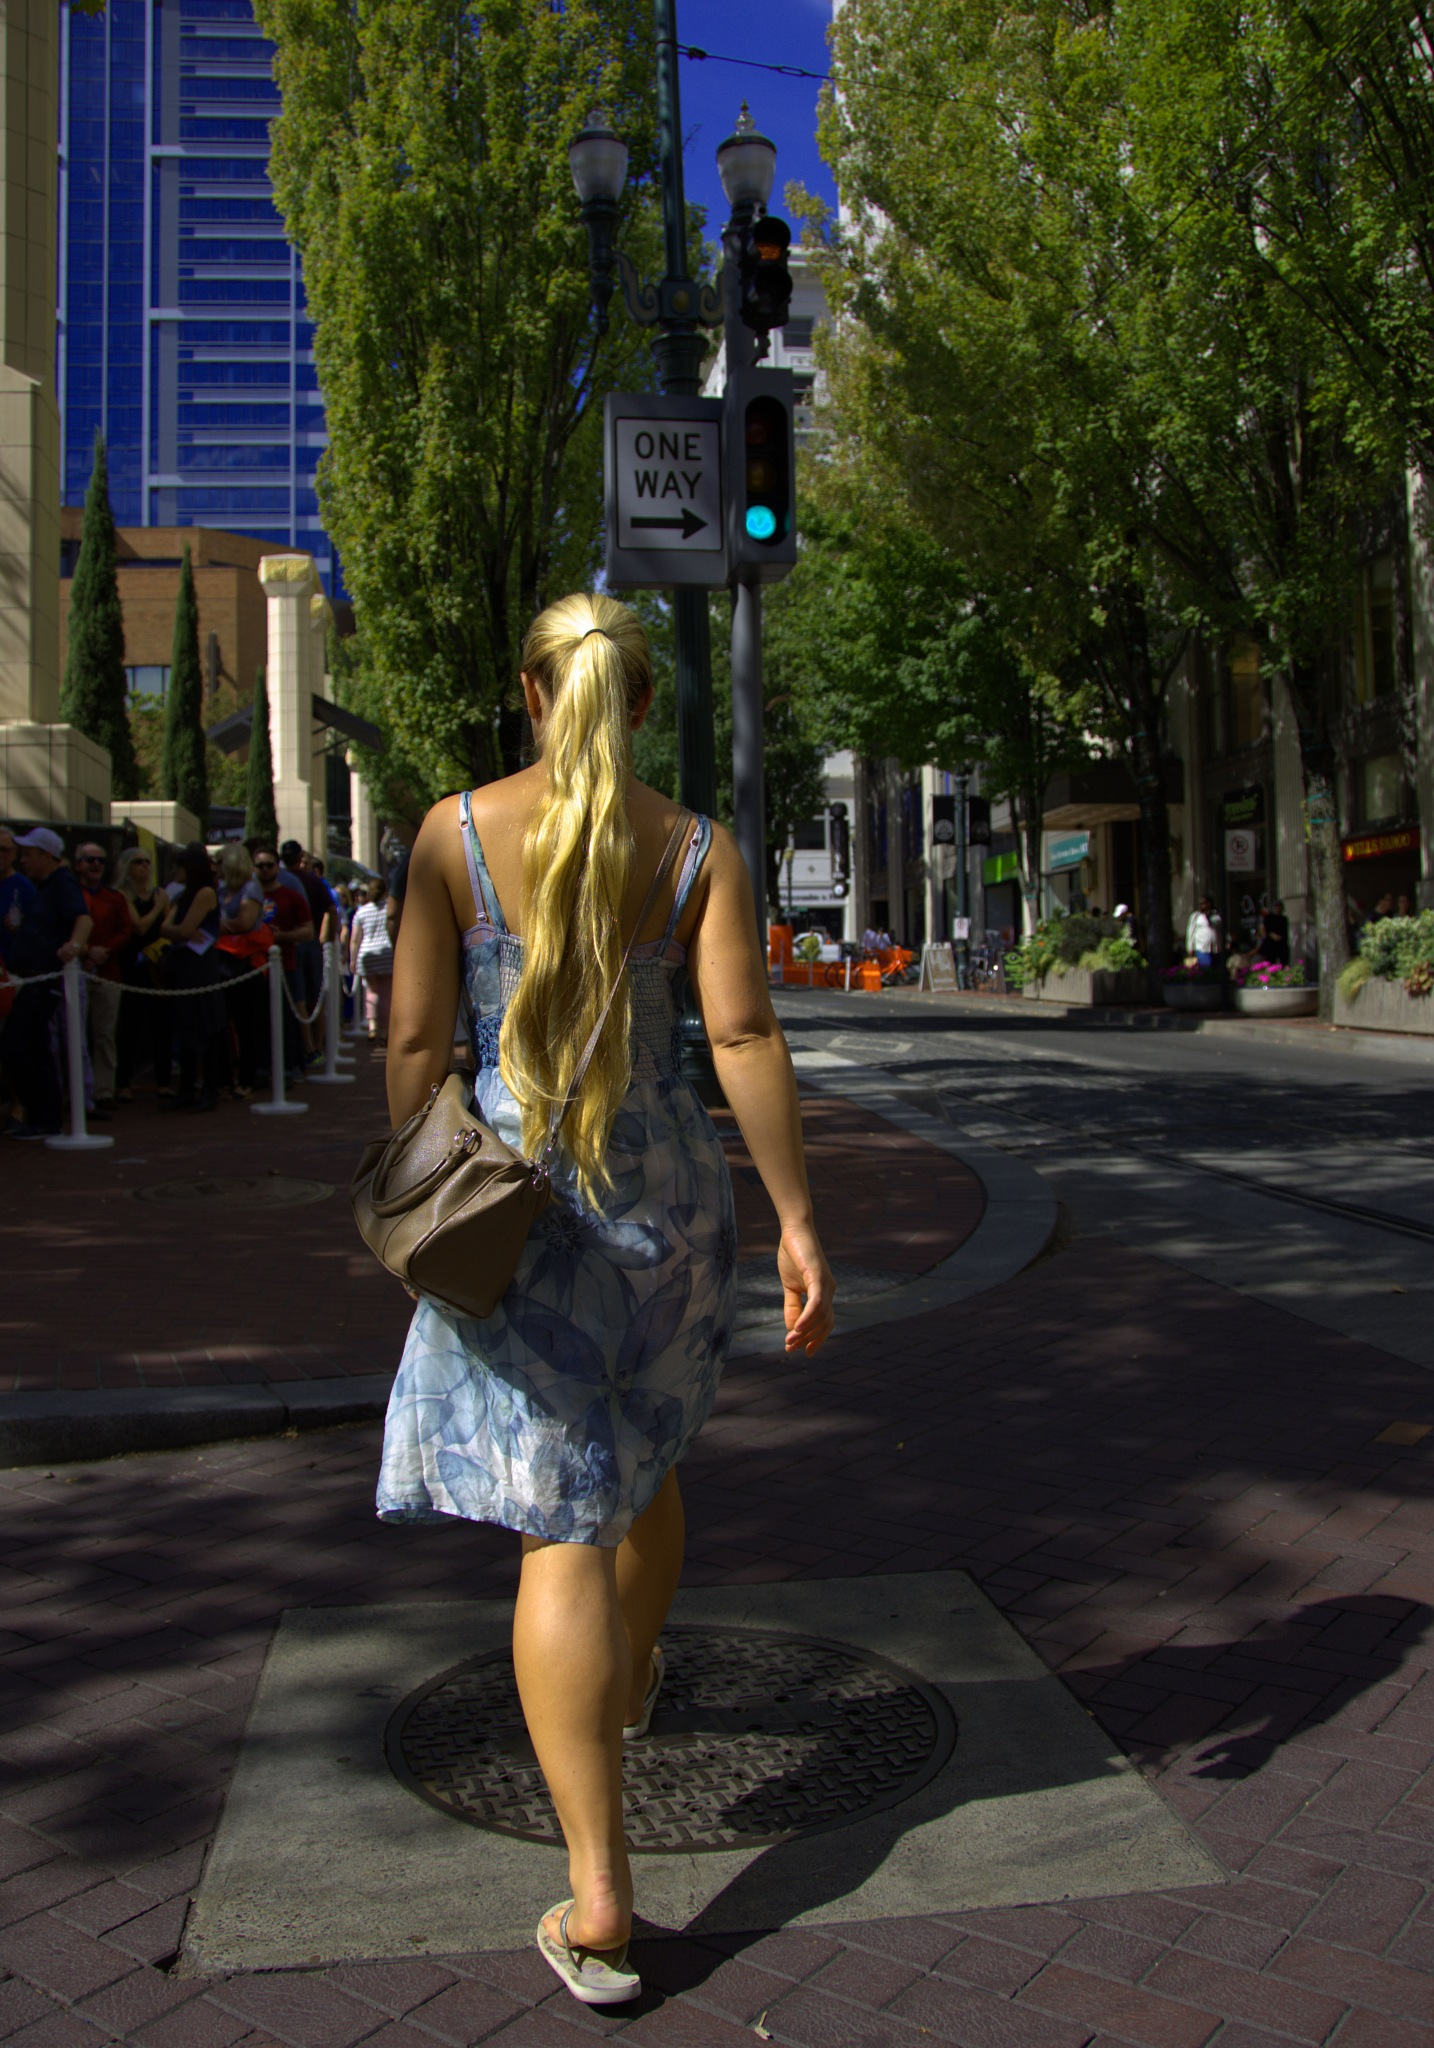 Crosswalk by pscottwong